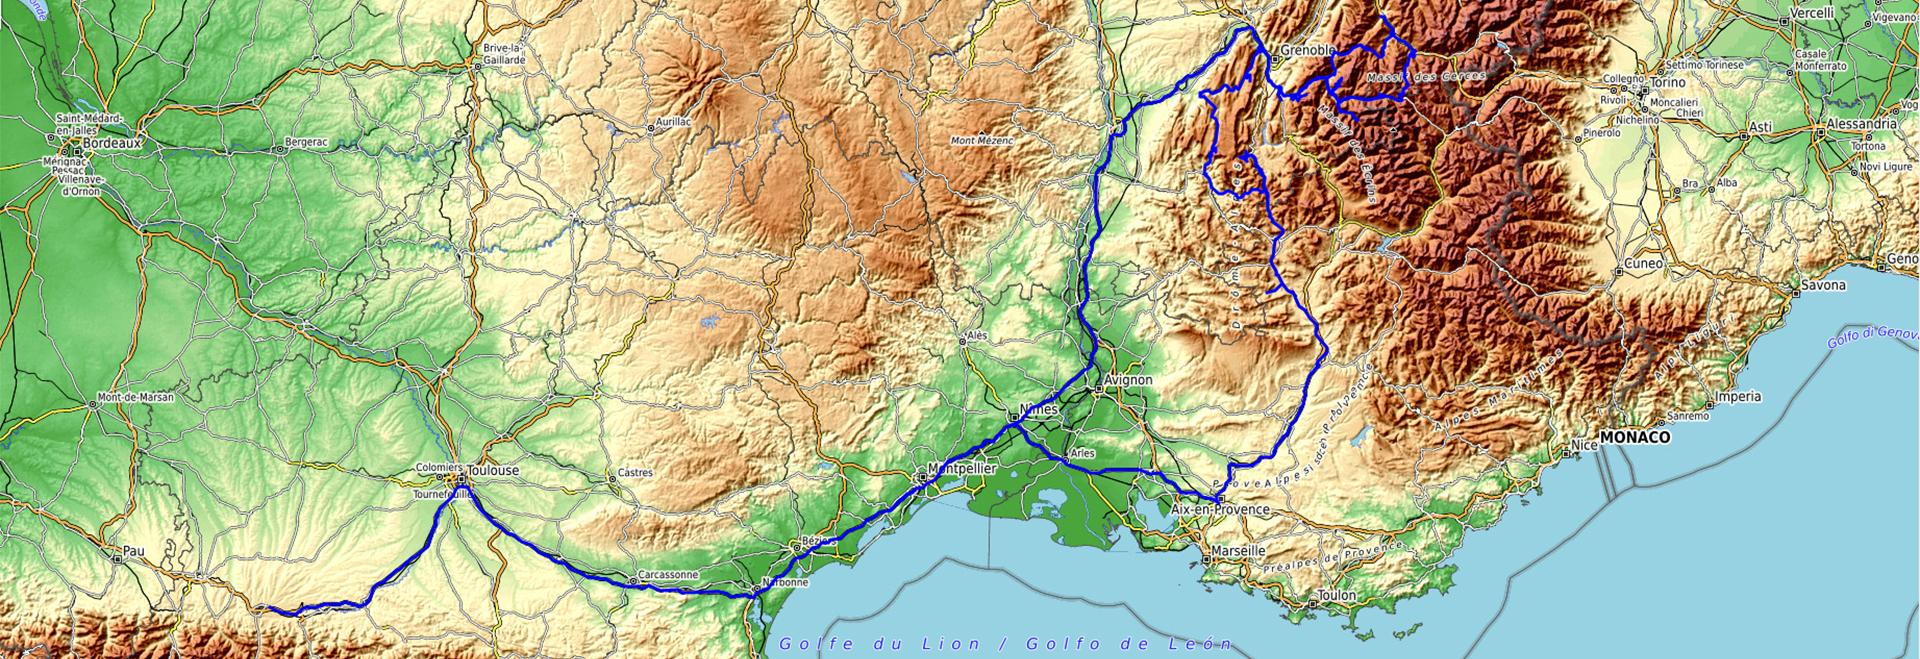 Roadtrip Alpes 2020